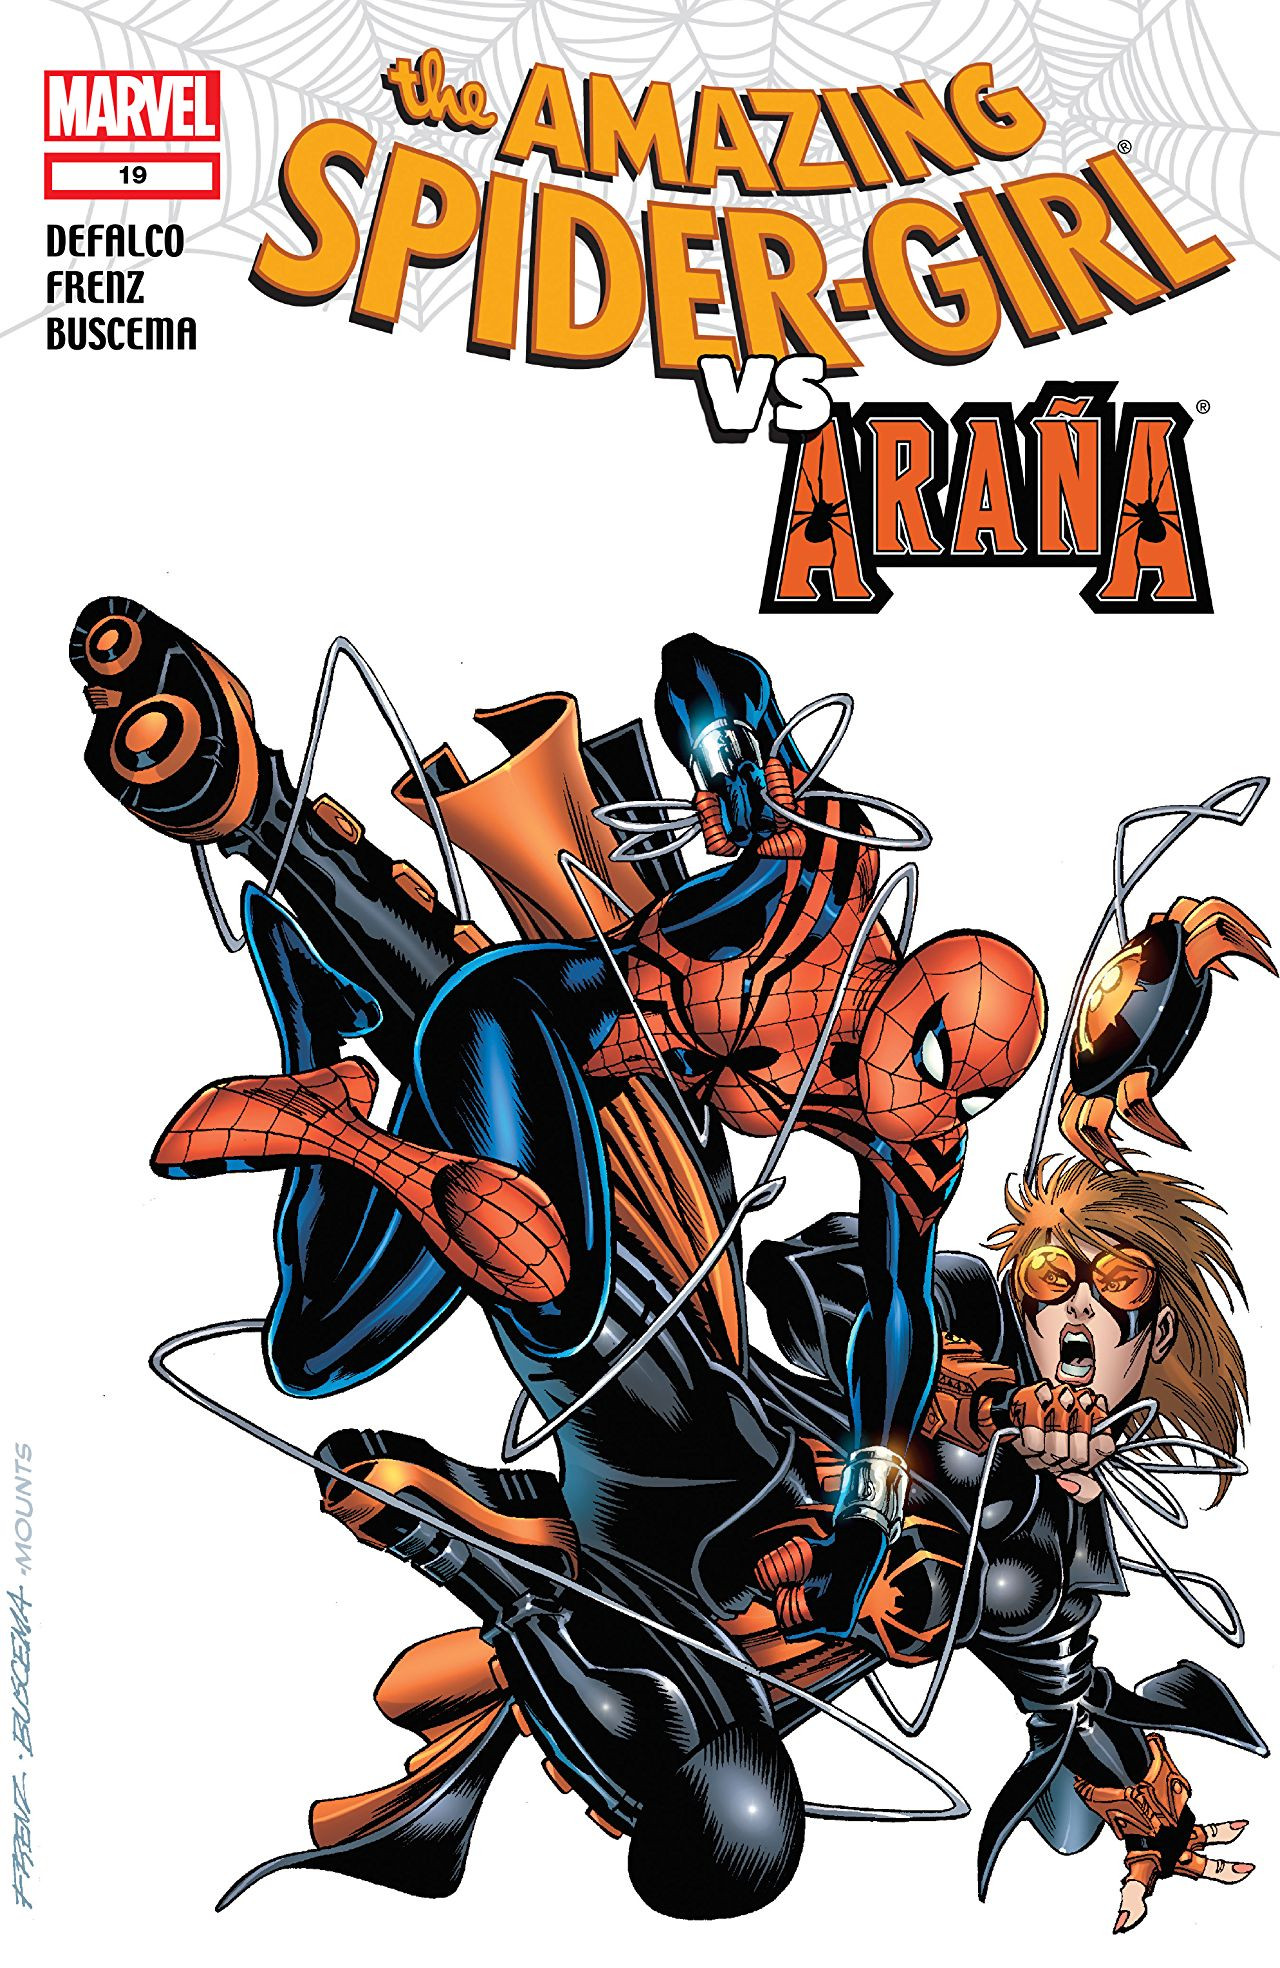 Amazing Spider-Girl Vol 1 19